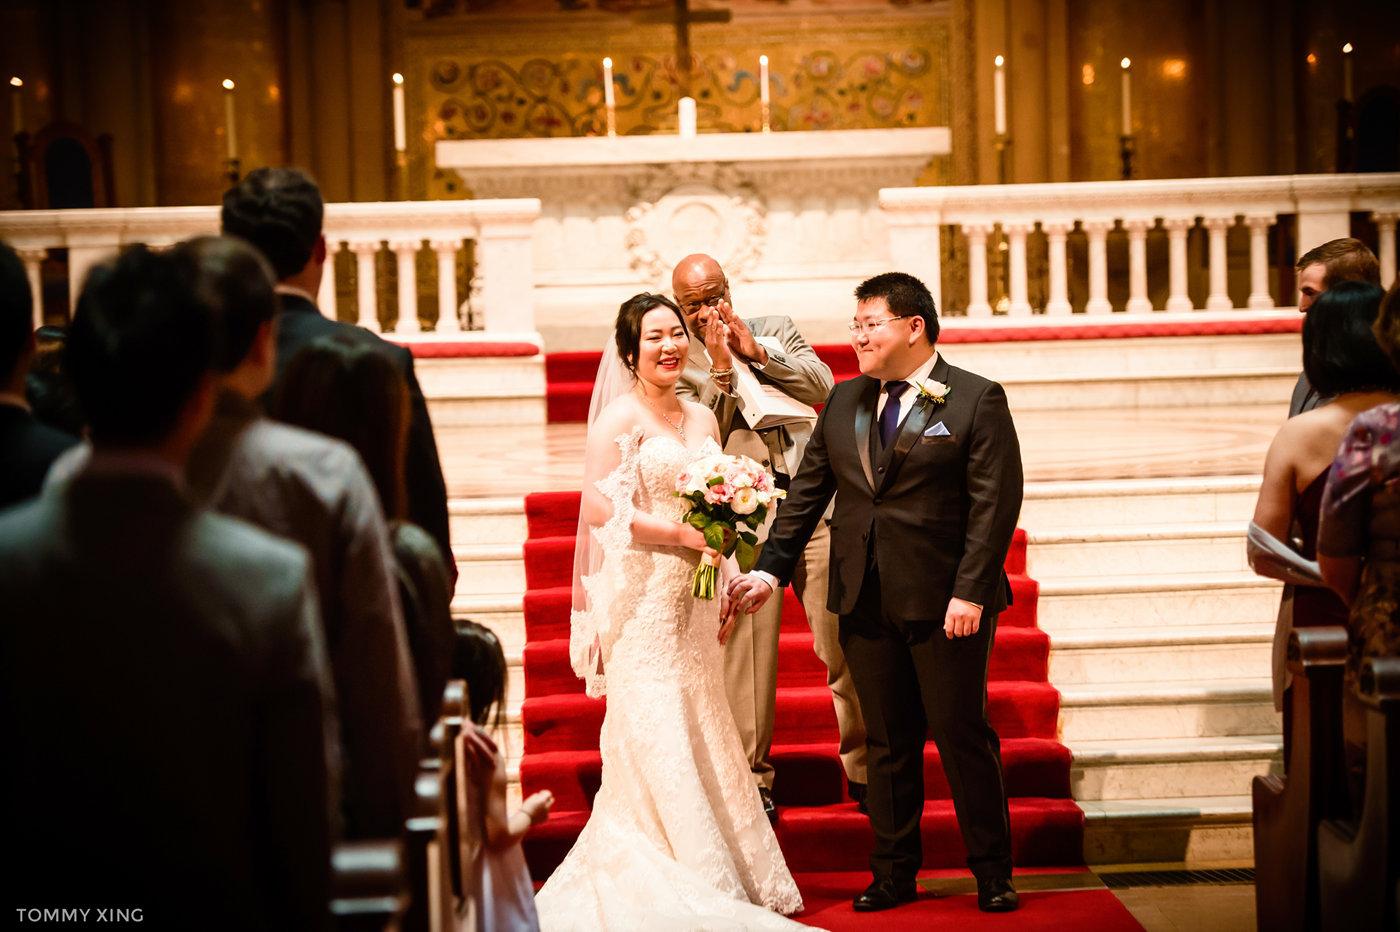 STANFORD MEMORIAL CHURCH WEDDING - Wenjie & Chengcheng - SAN FRANCISCO BAY AREA 斯坦福教堂婚礼跟拍 - 洛杉矶婚礼婚纱照摄影师 Tommy Xing Photography087.jpg